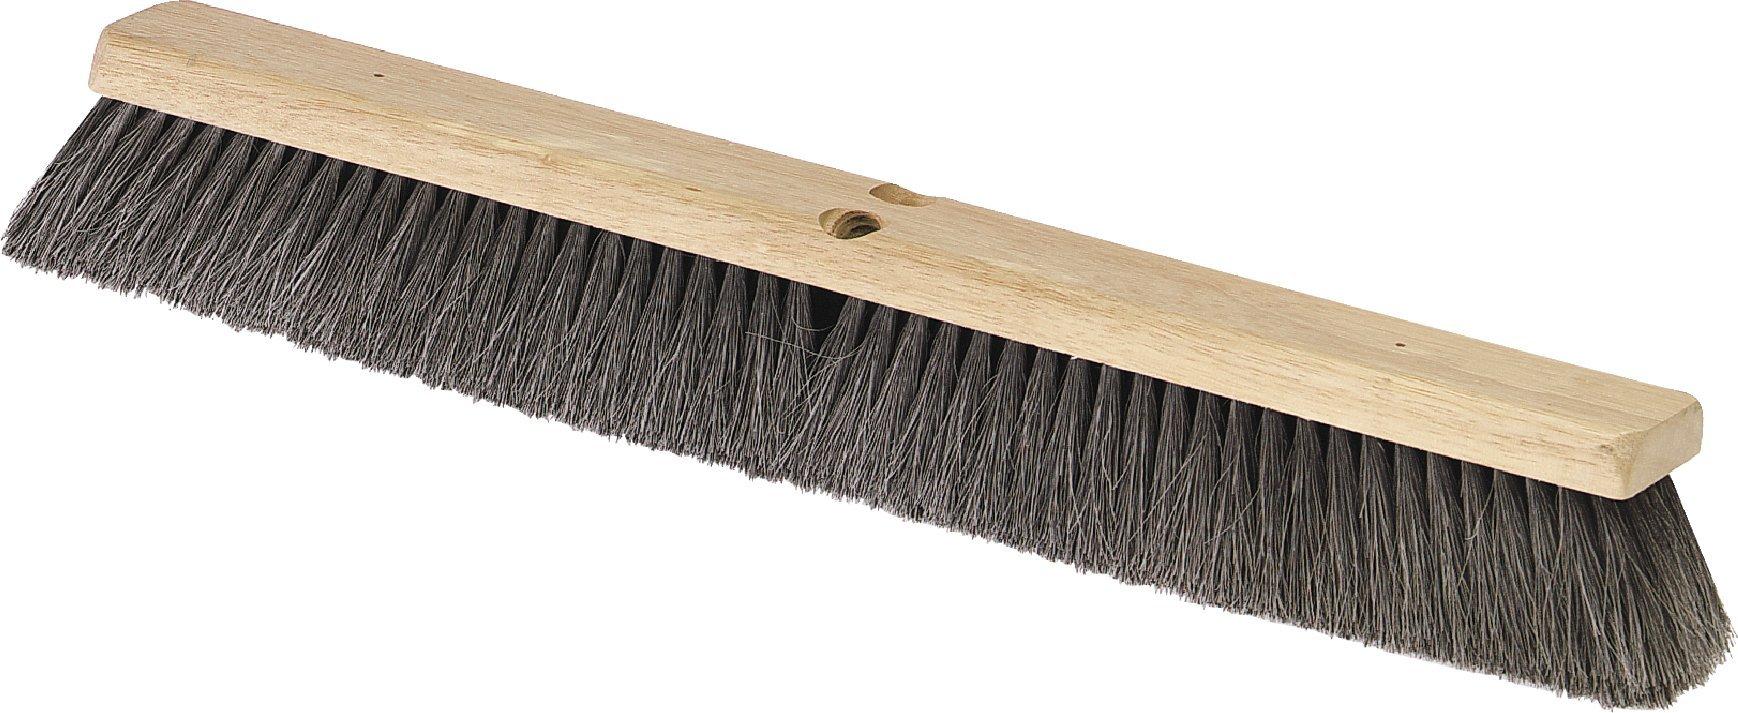 Carlisle 364342403 Hardwood Block Fine Floor Sweep, Pure Horsehair Bristles, 24'' Length, Black